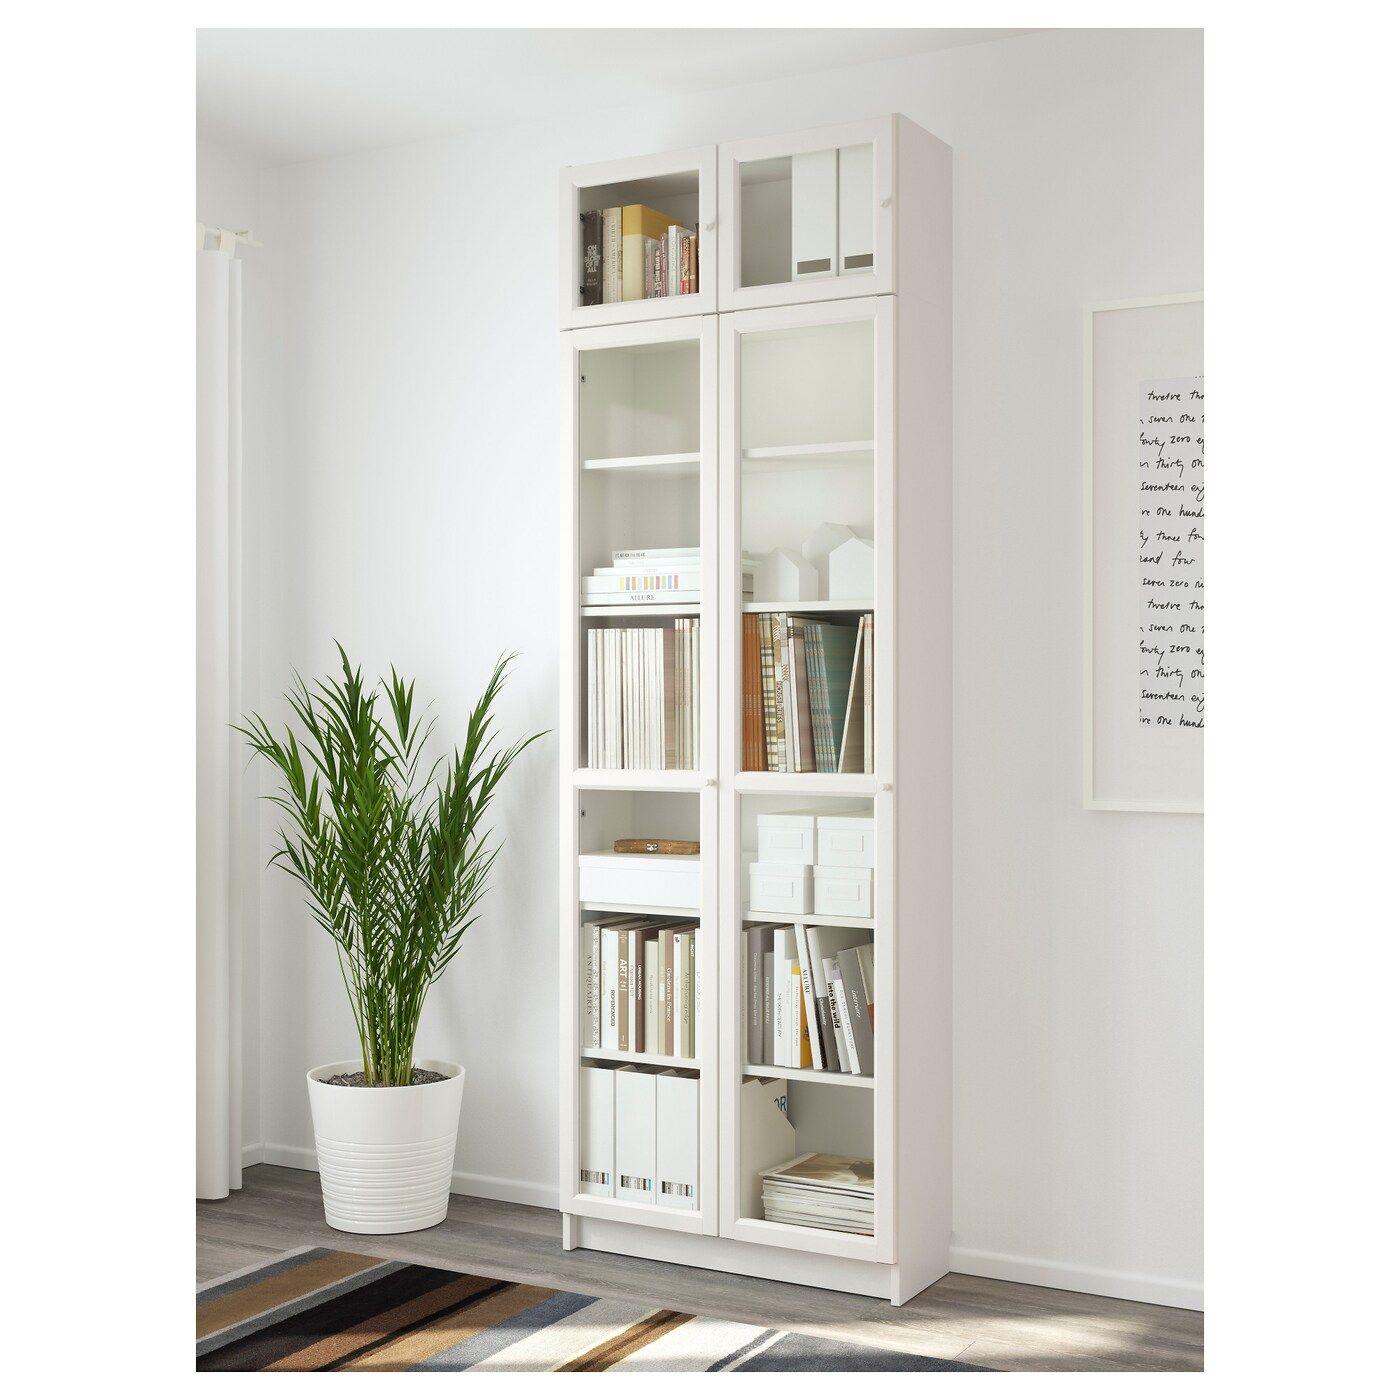 IKEA BILLY / OXBERG Bücherregal – weiß